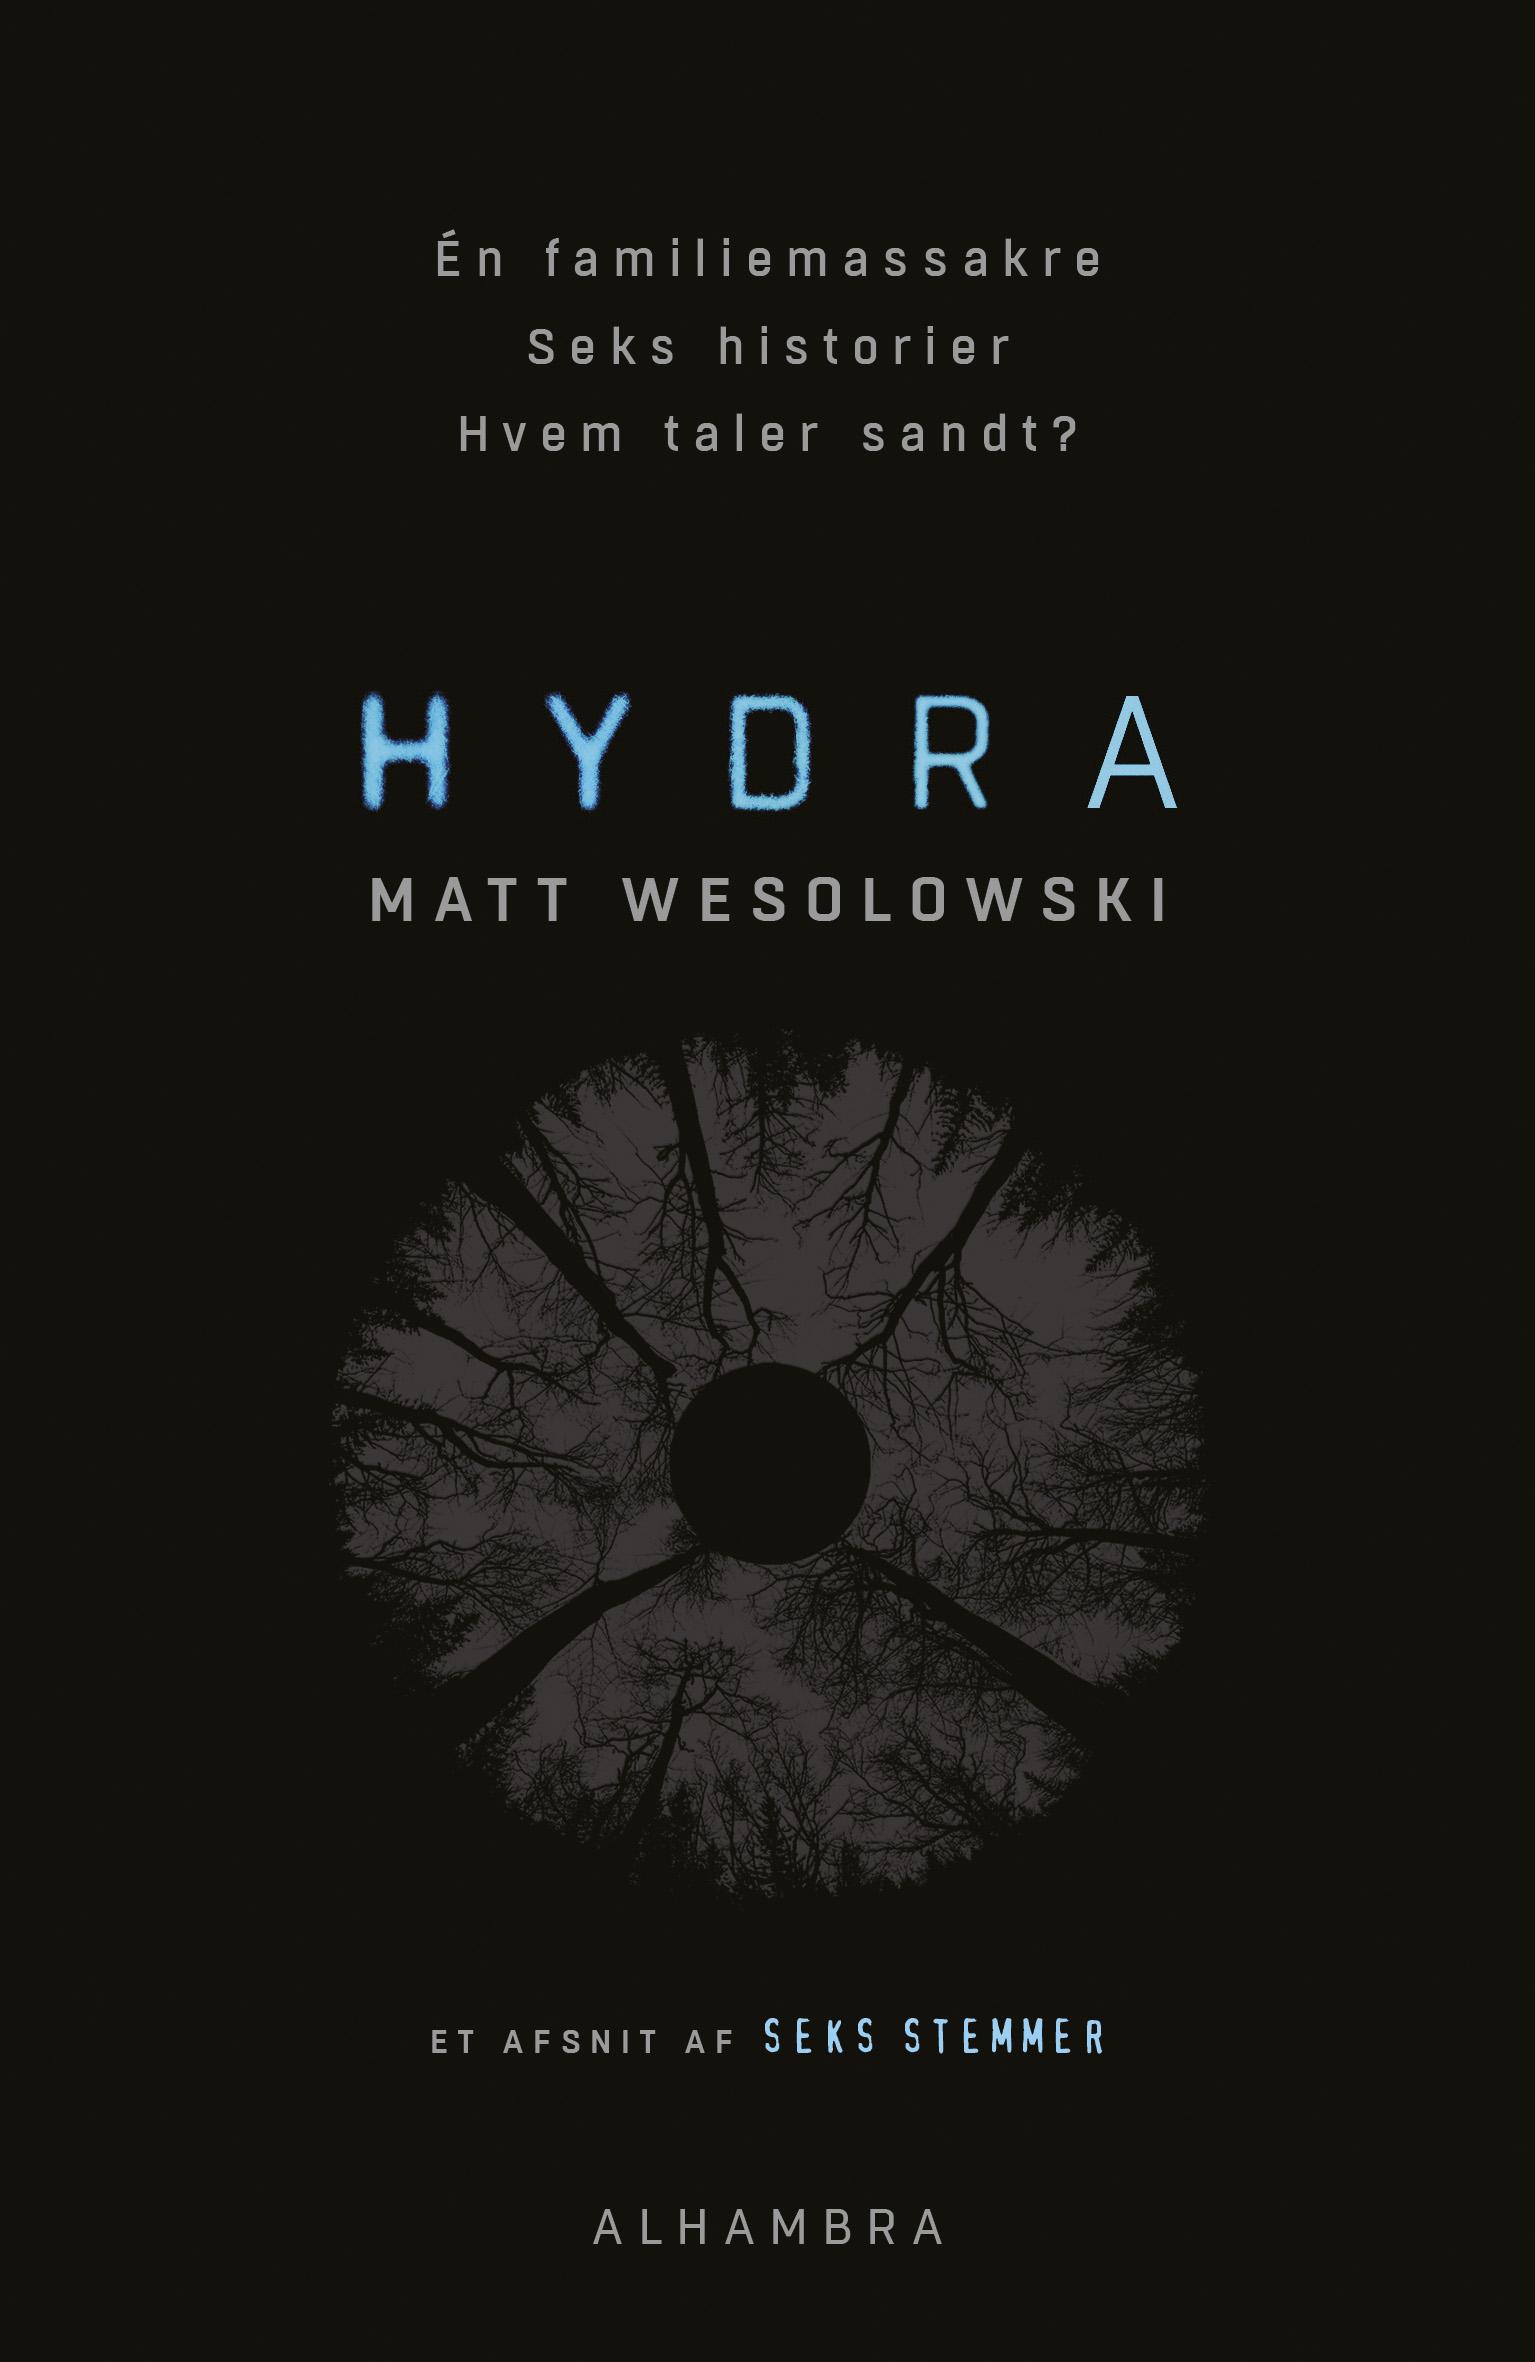 Hydra_forside